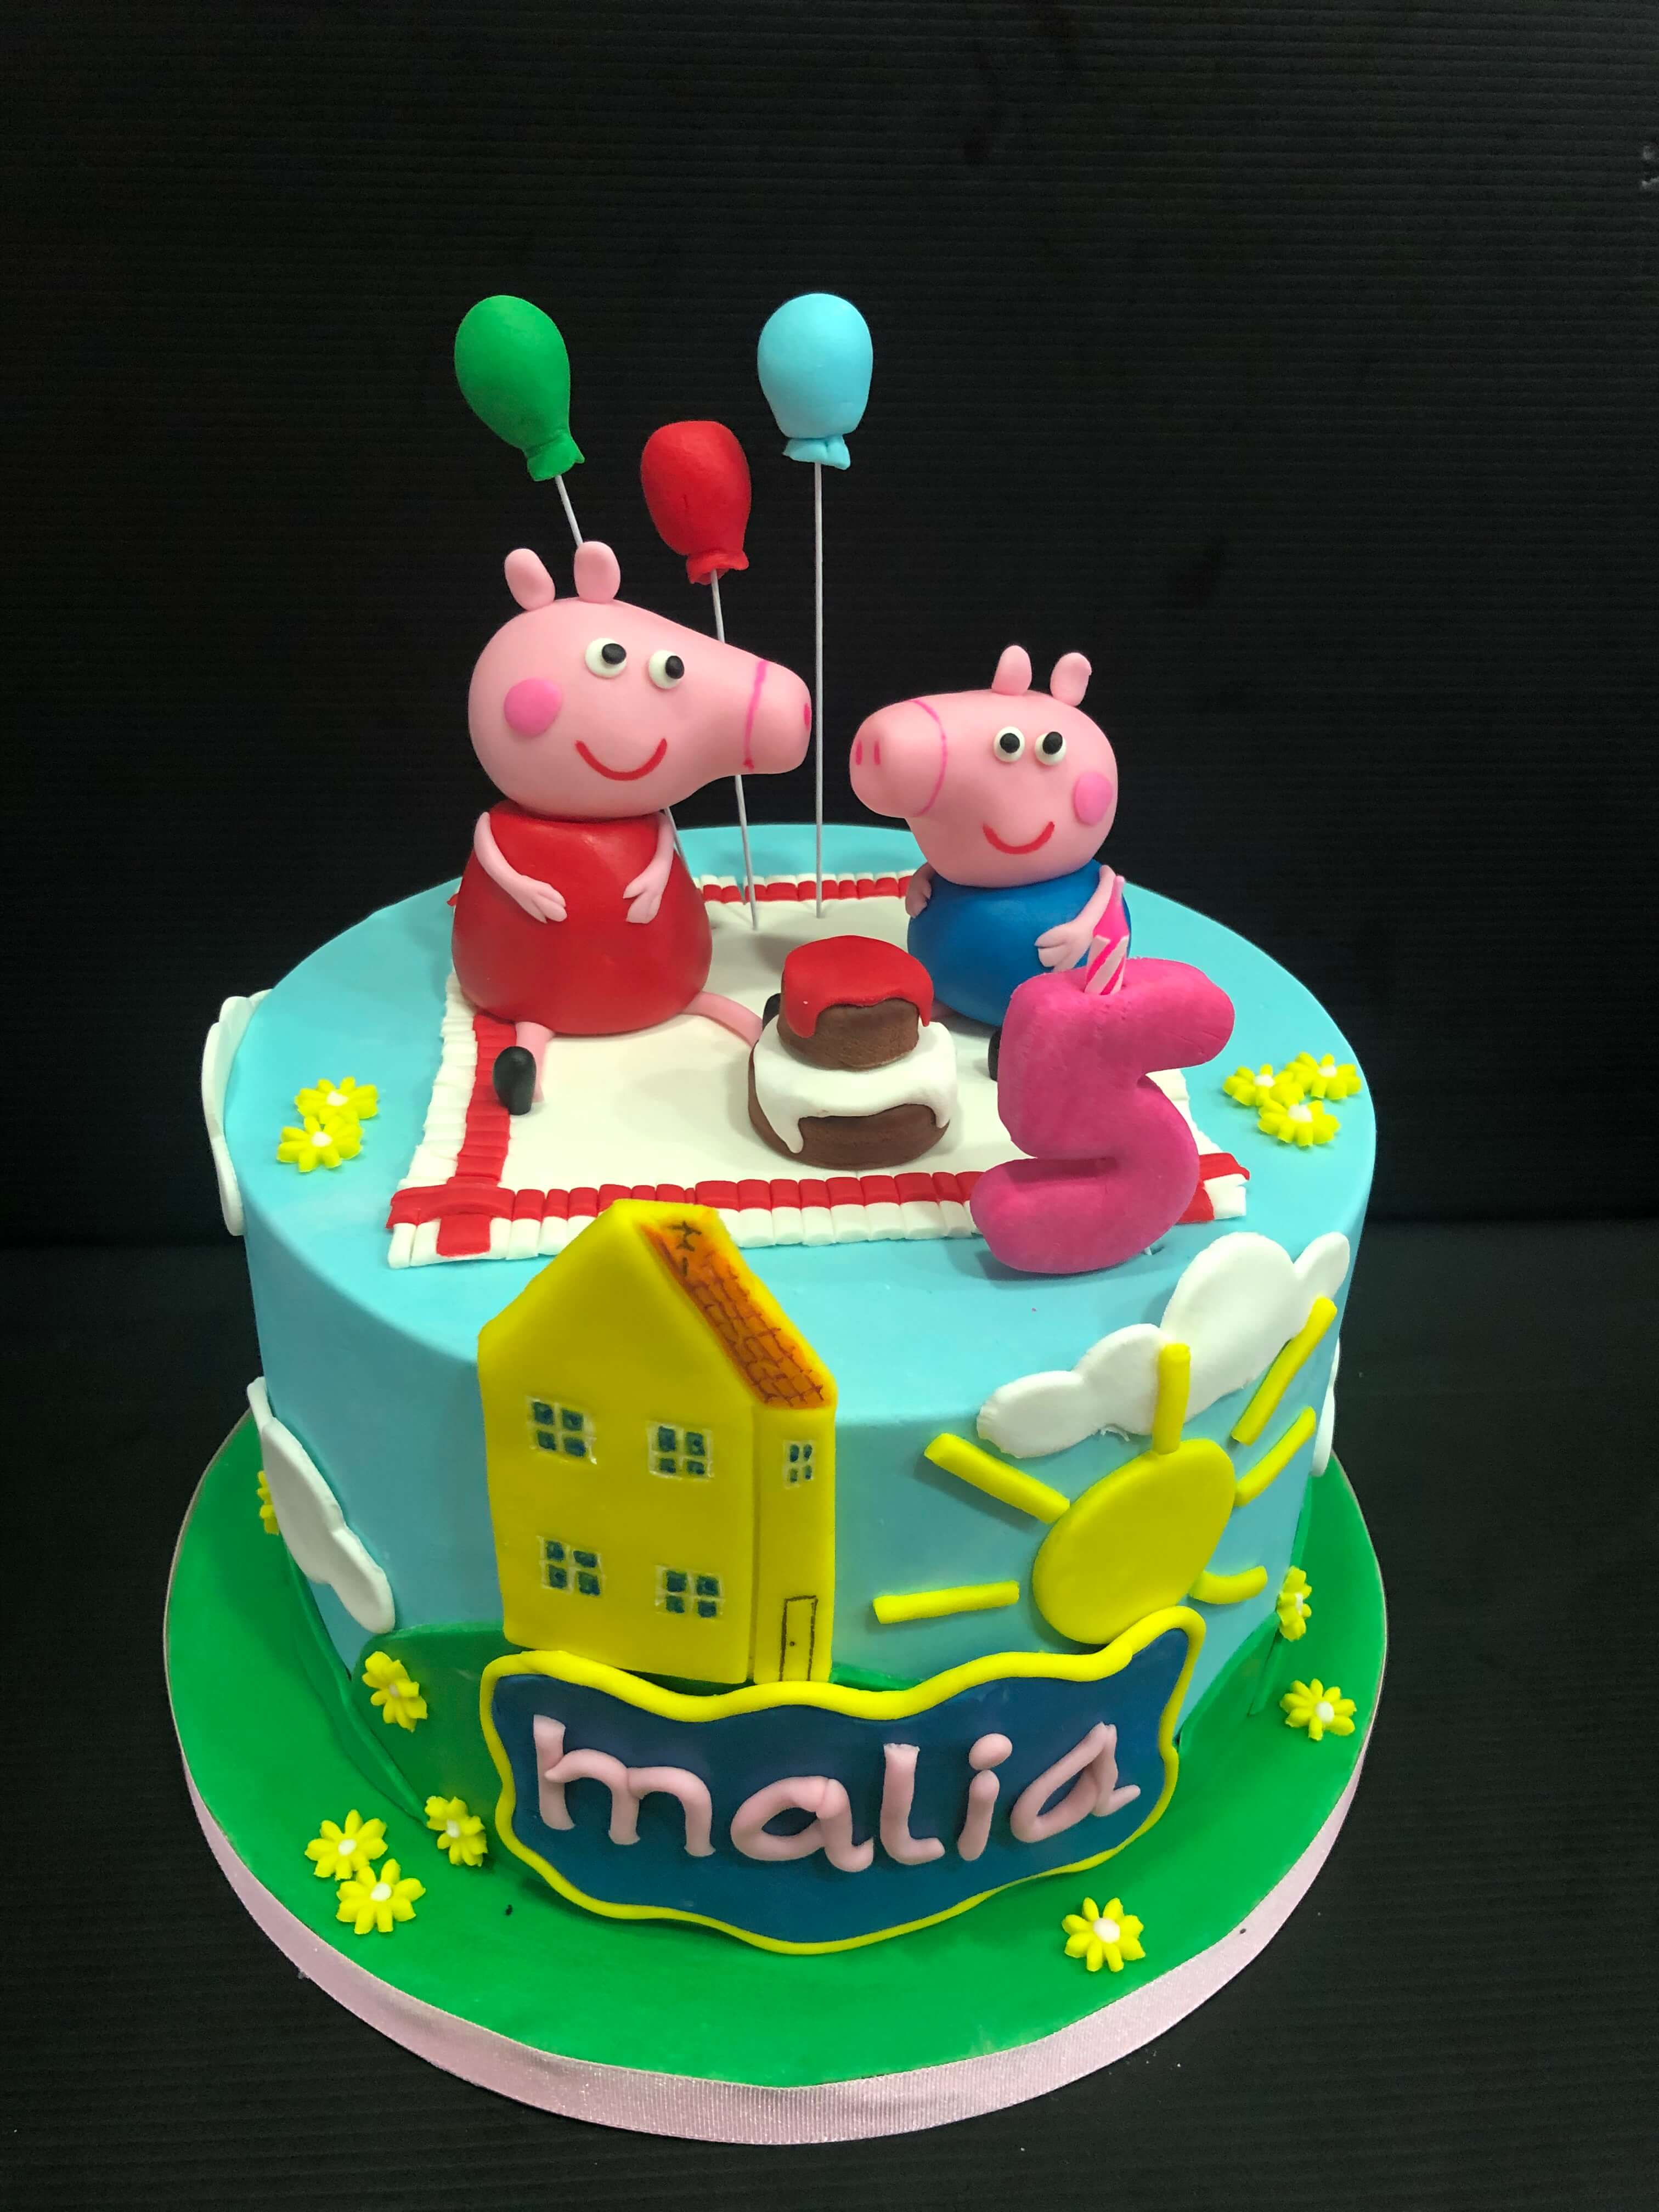 Tarta cumpleaños coruña personalizada peppa pig